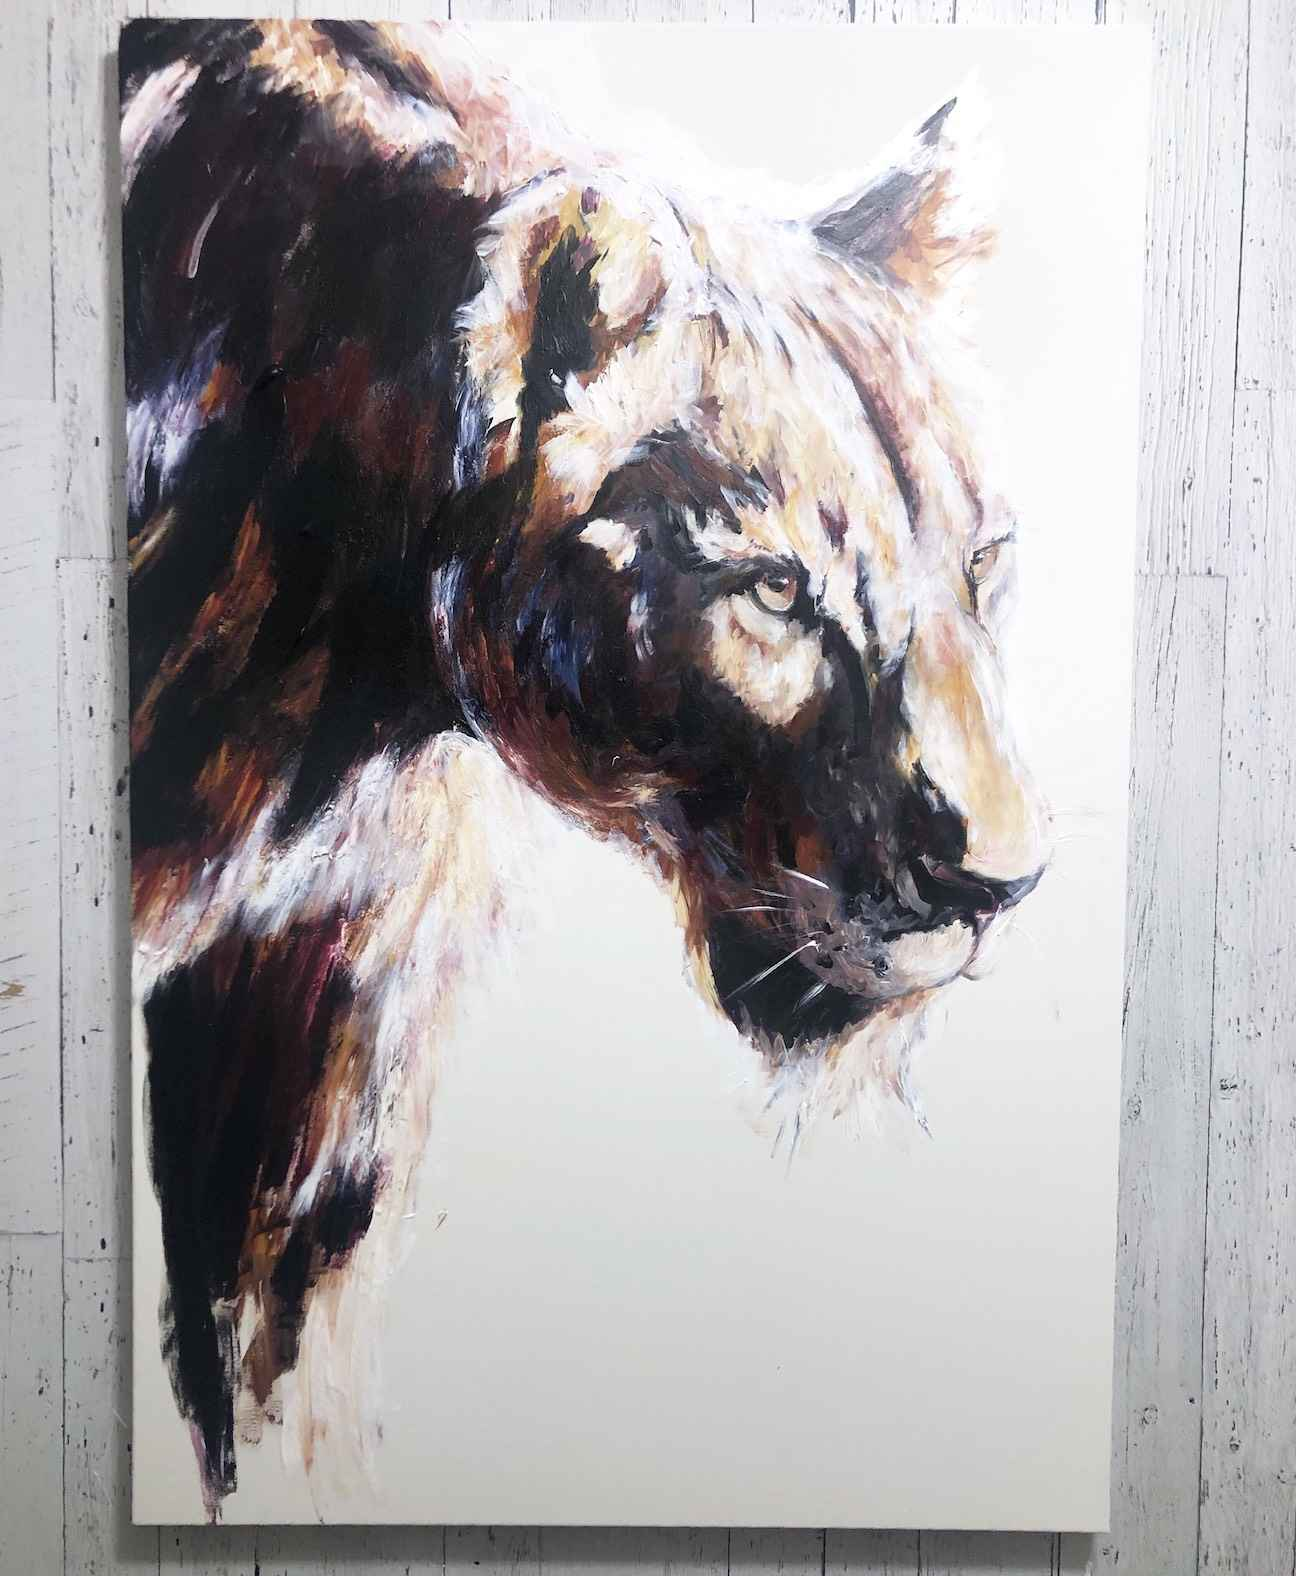 Entrust by  Michael Sydoryk - Masterpiece Online